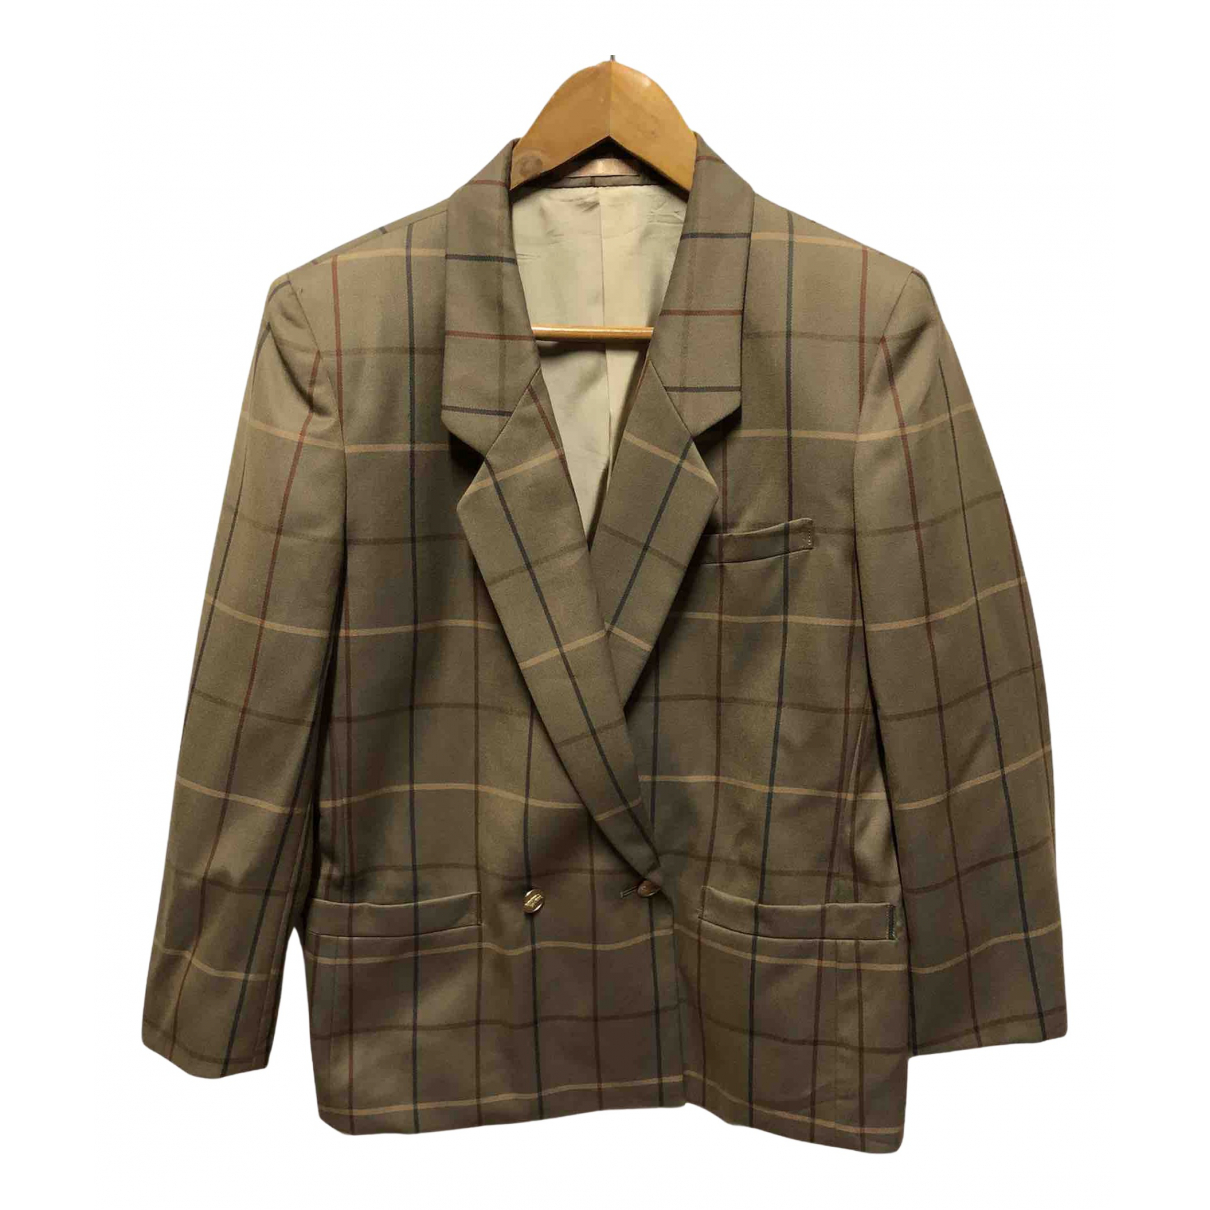 Burberry N Beige Cotton jacket  for Men M International